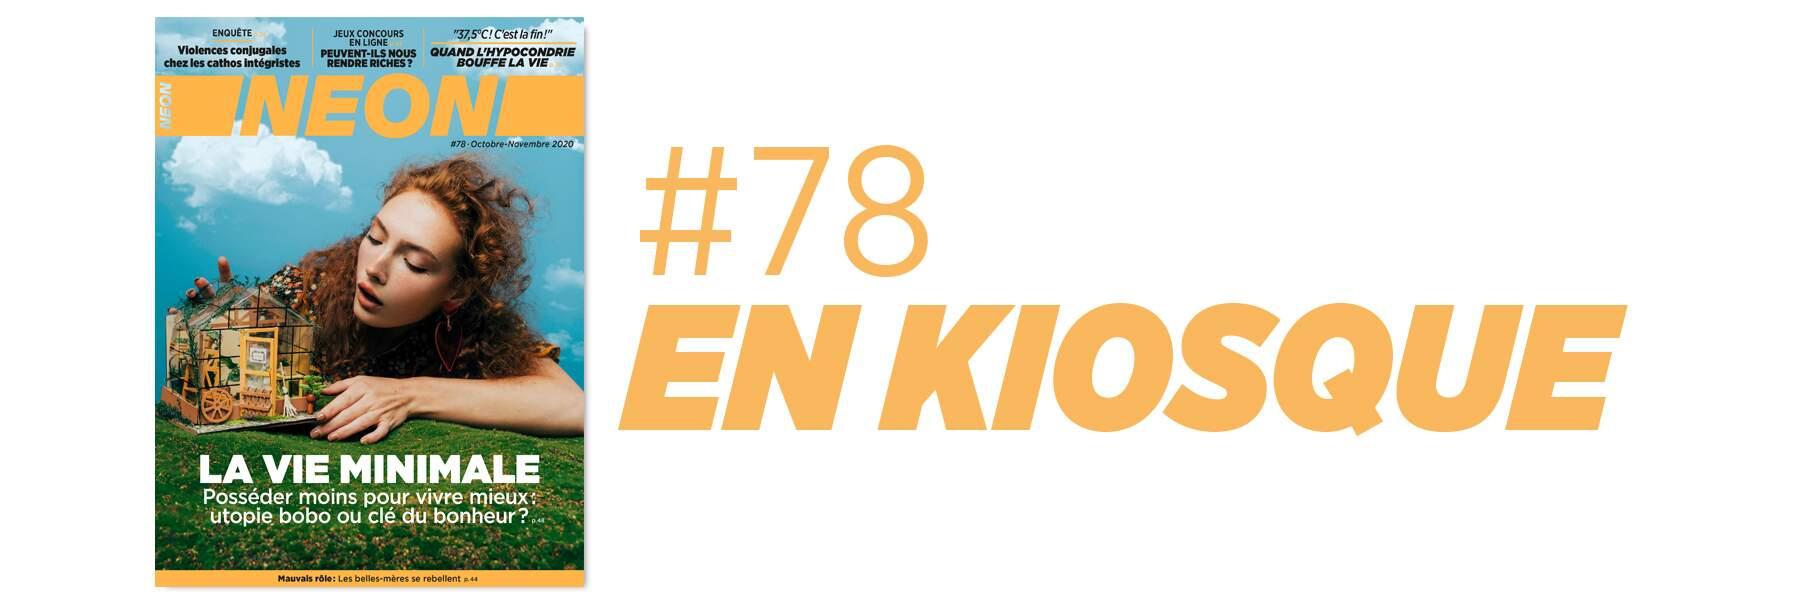 NEON #78 est en kiosque